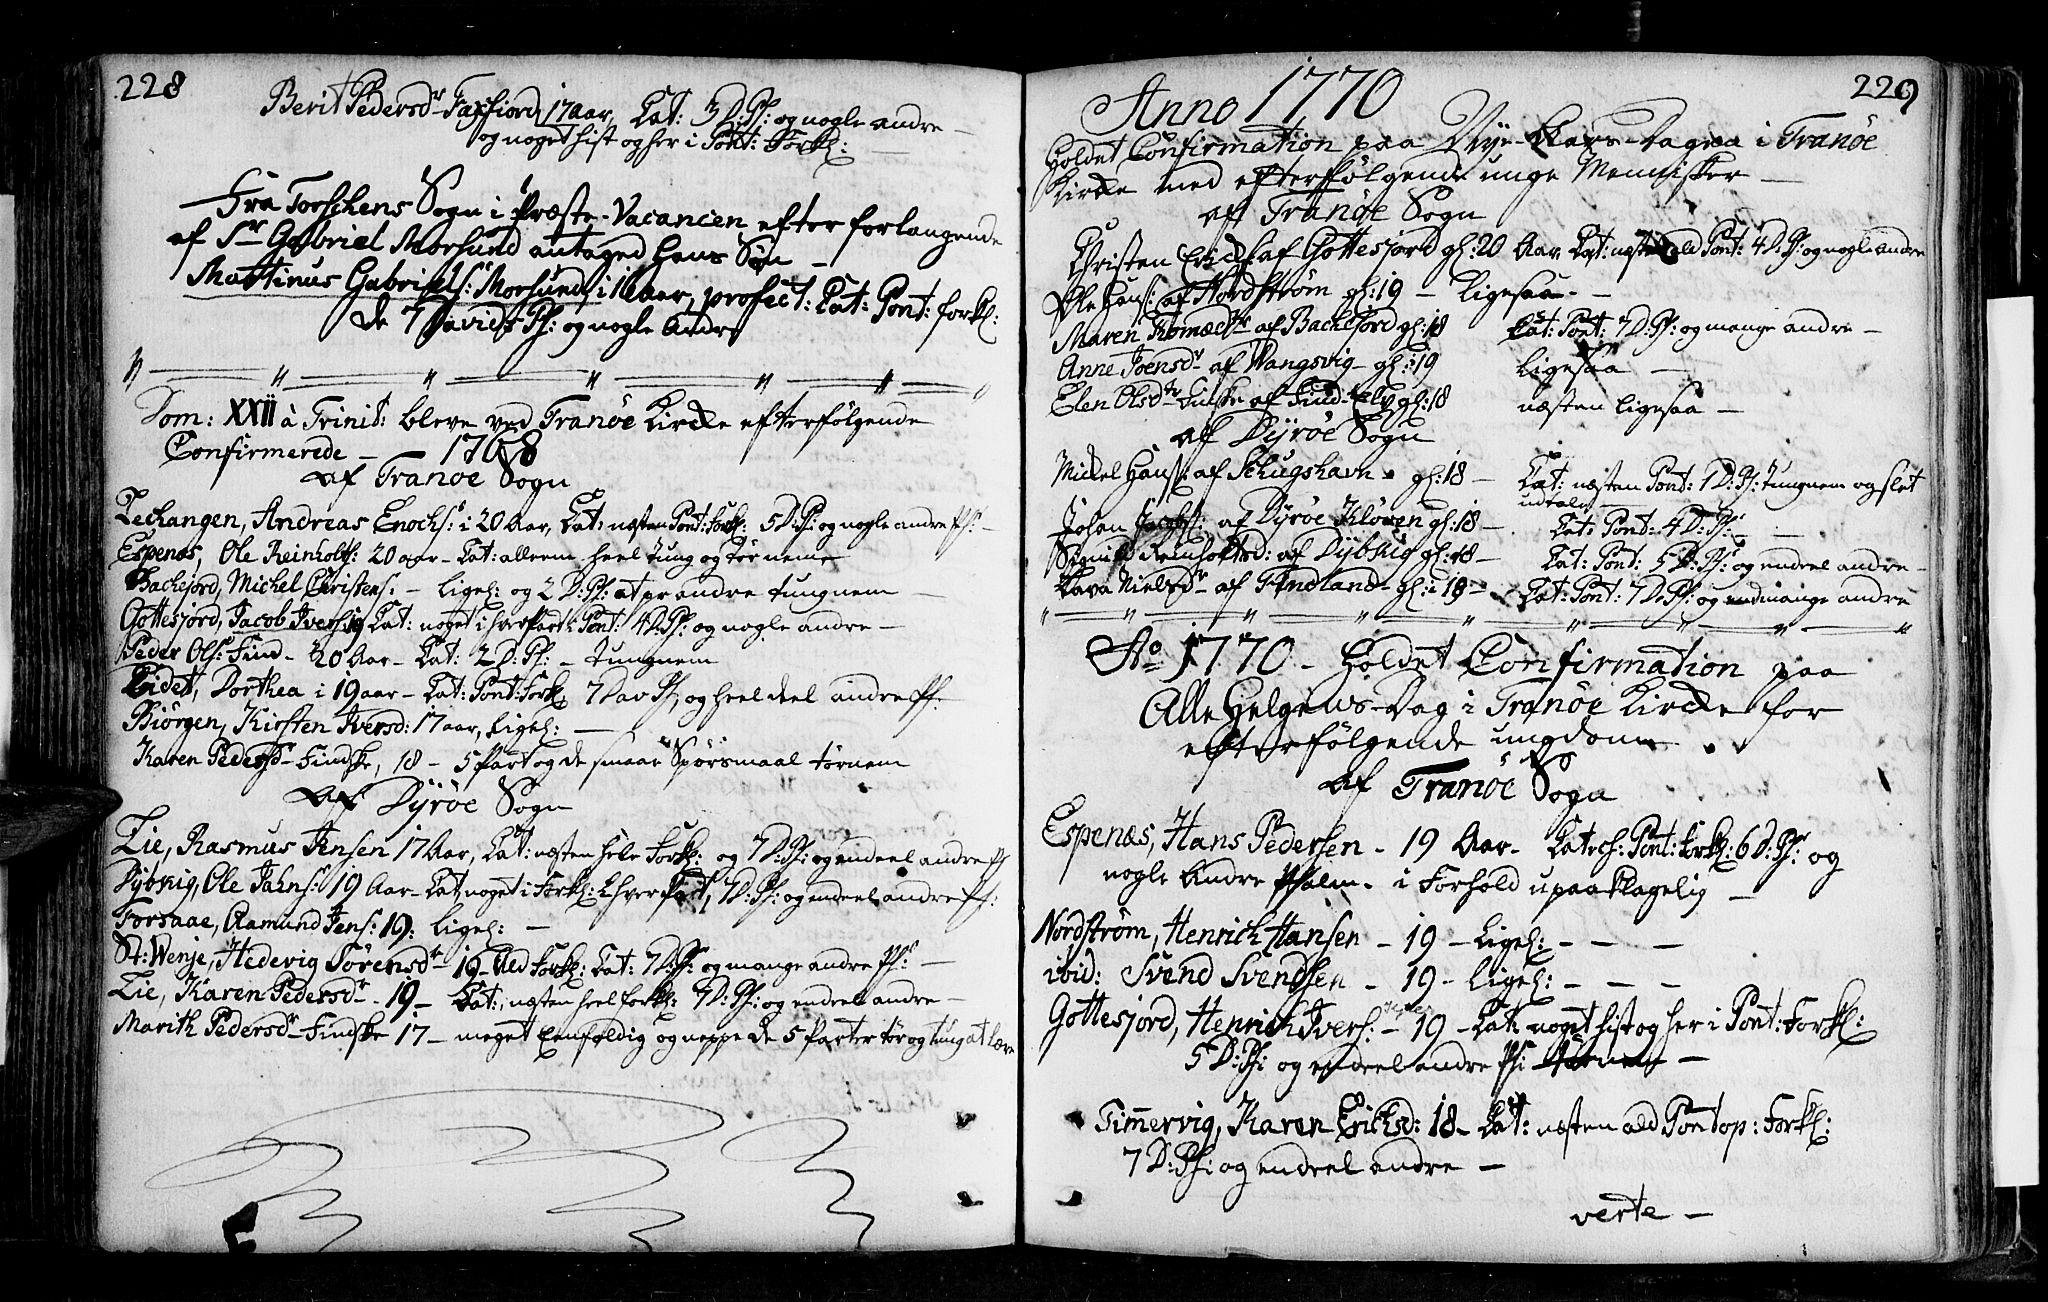 SATØ, Tranøy sokneprestkontor, I/Ia/Iaa/L0001kirke: Ministerialbok nr. 1, 1757-1773, s. 228-229